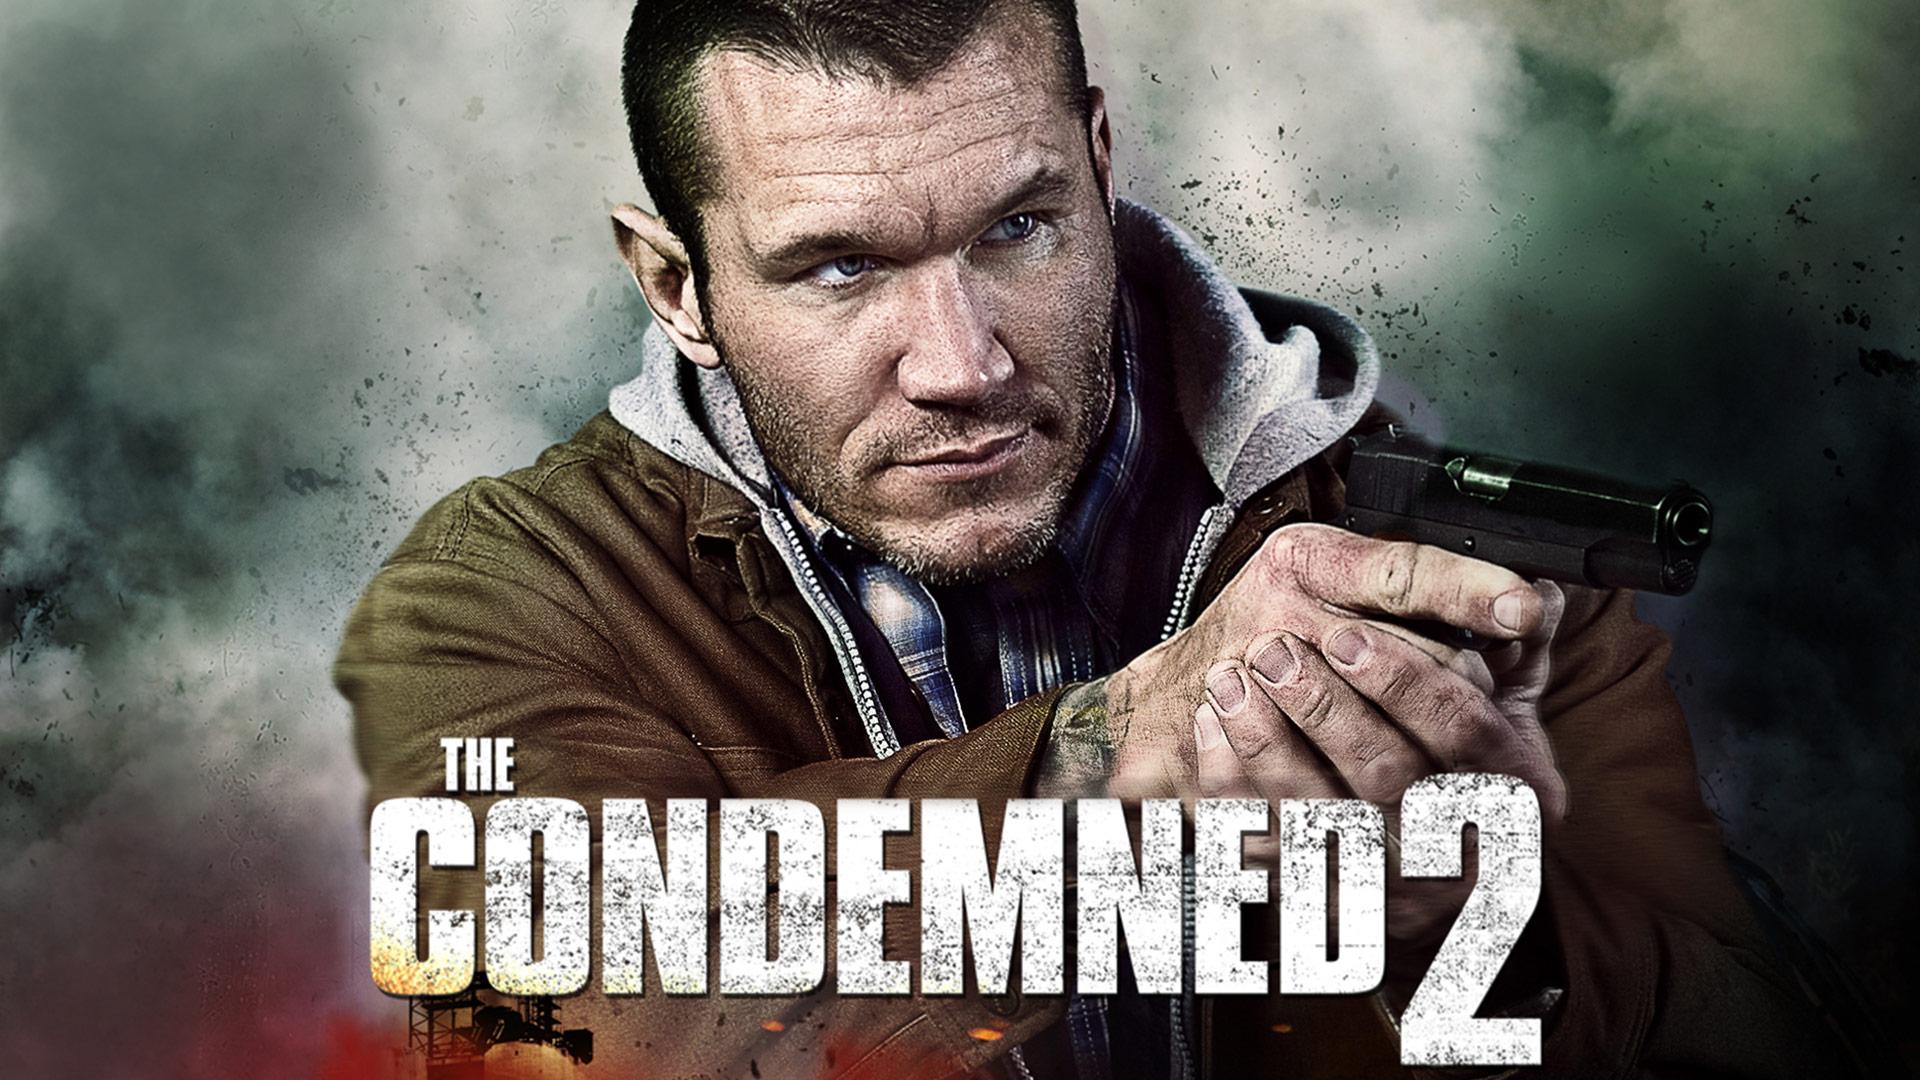 12 rounds 3 lockdown full movie online free